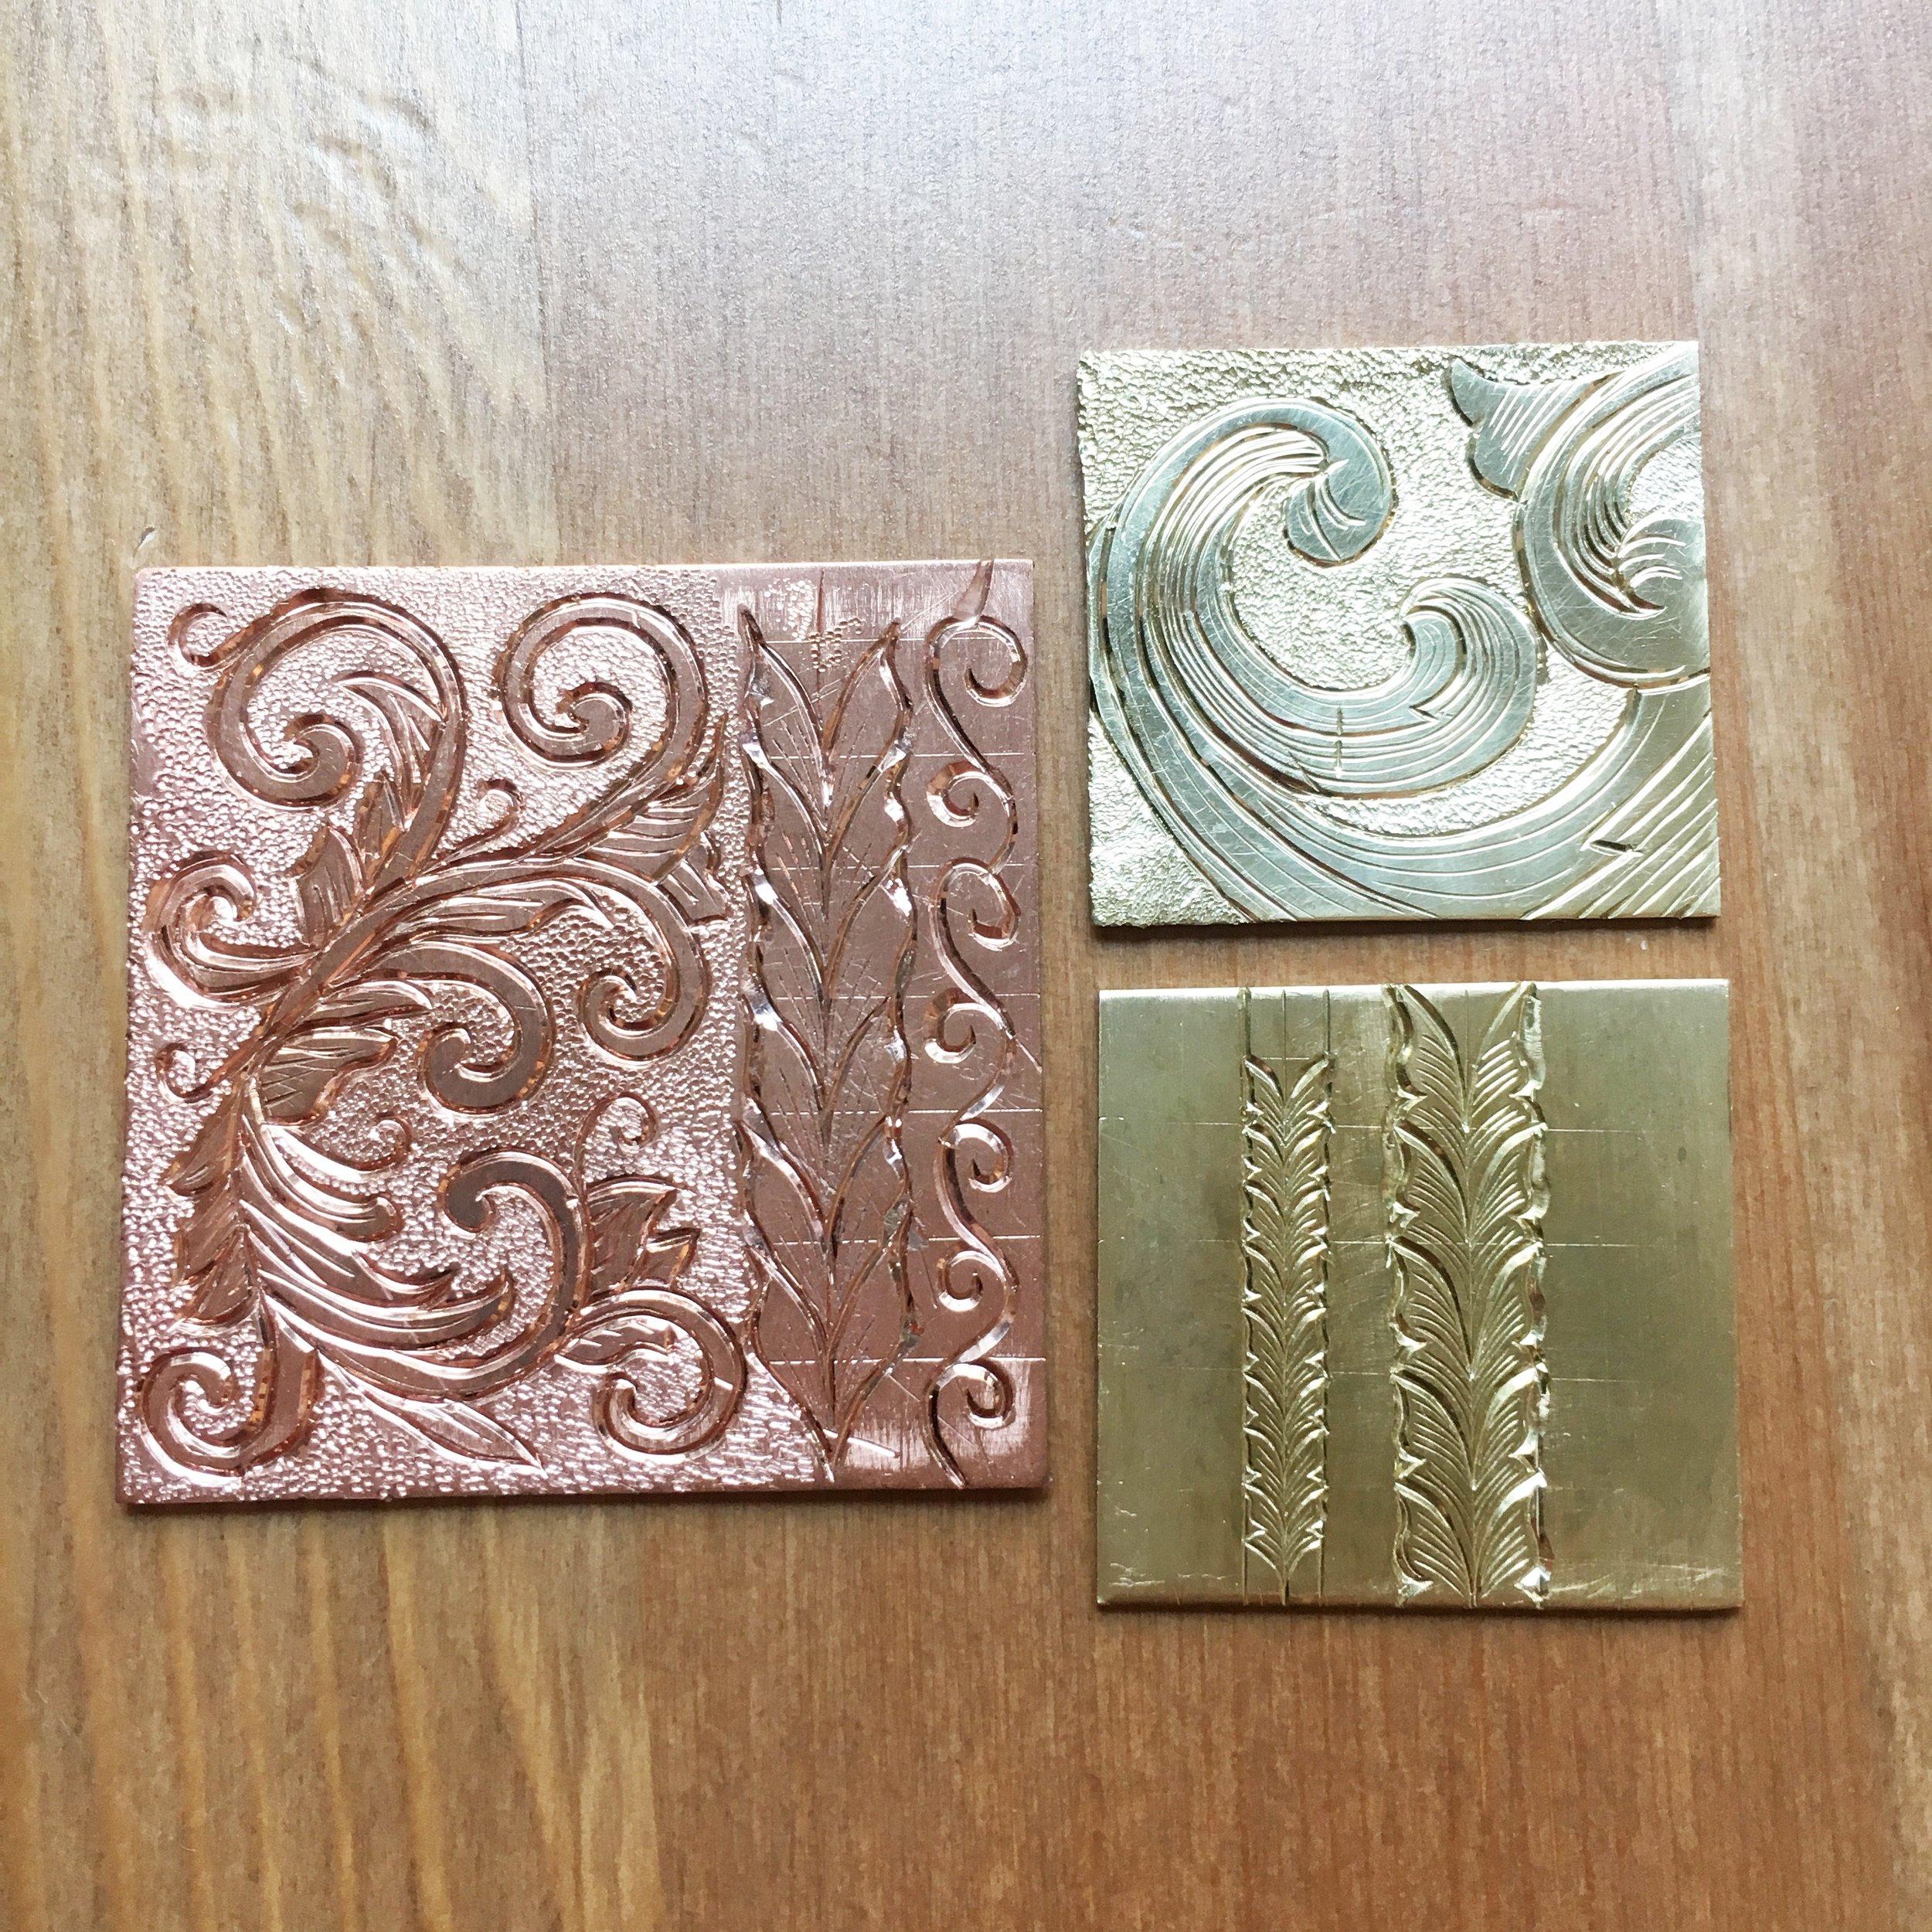 Engraving practice